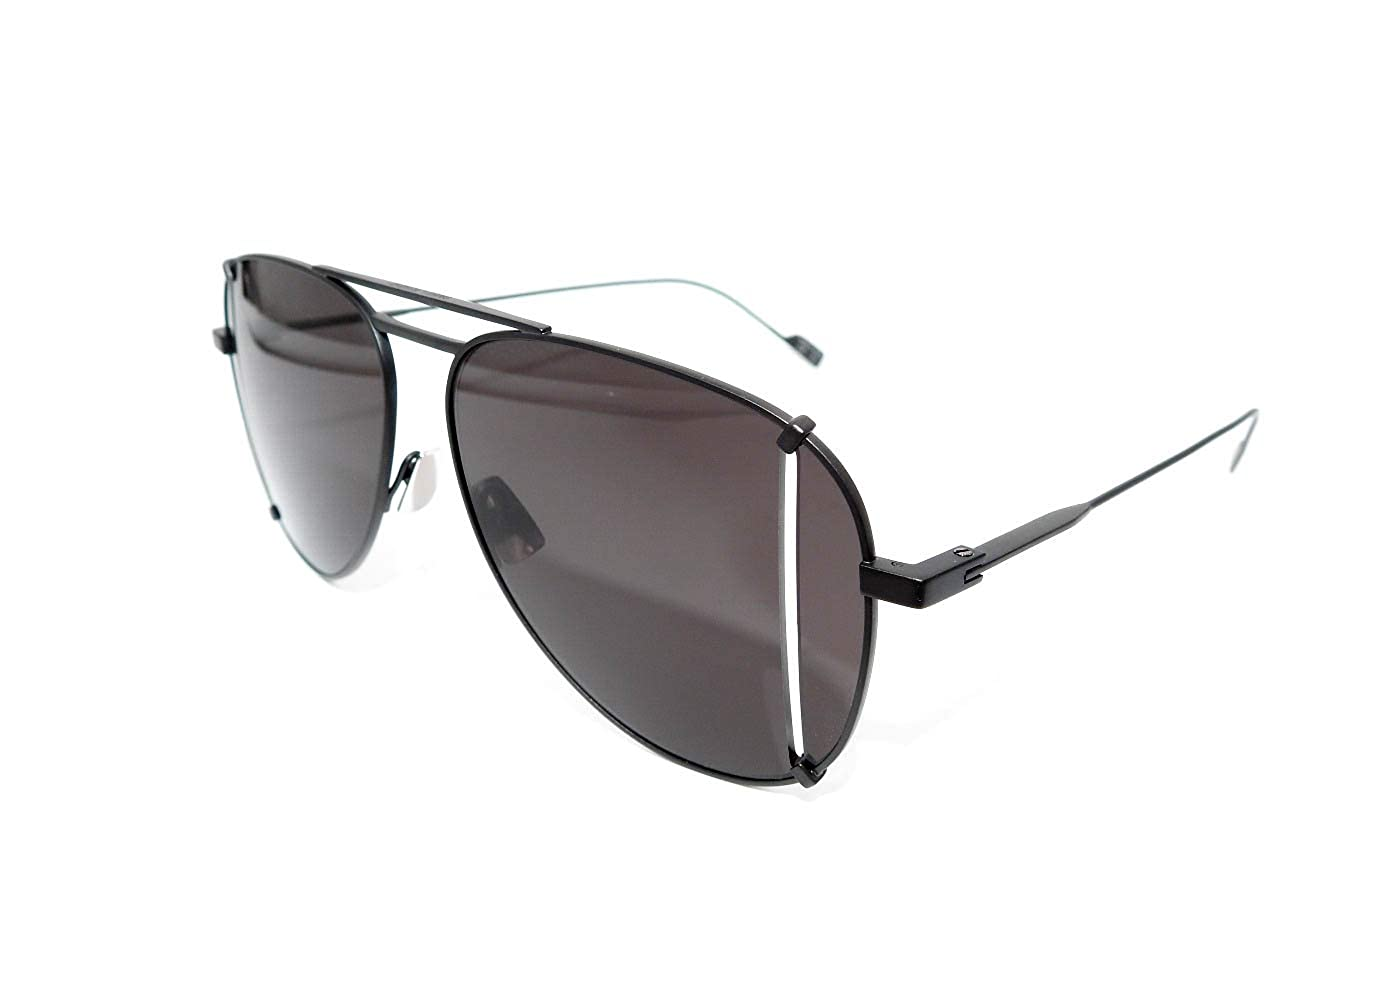 a3f5bfd947abf Amazon.com  Saint Laurent SL 193 T Cut 002 Black Metal Aviator Sunglasses  Grey Lens  Clothing